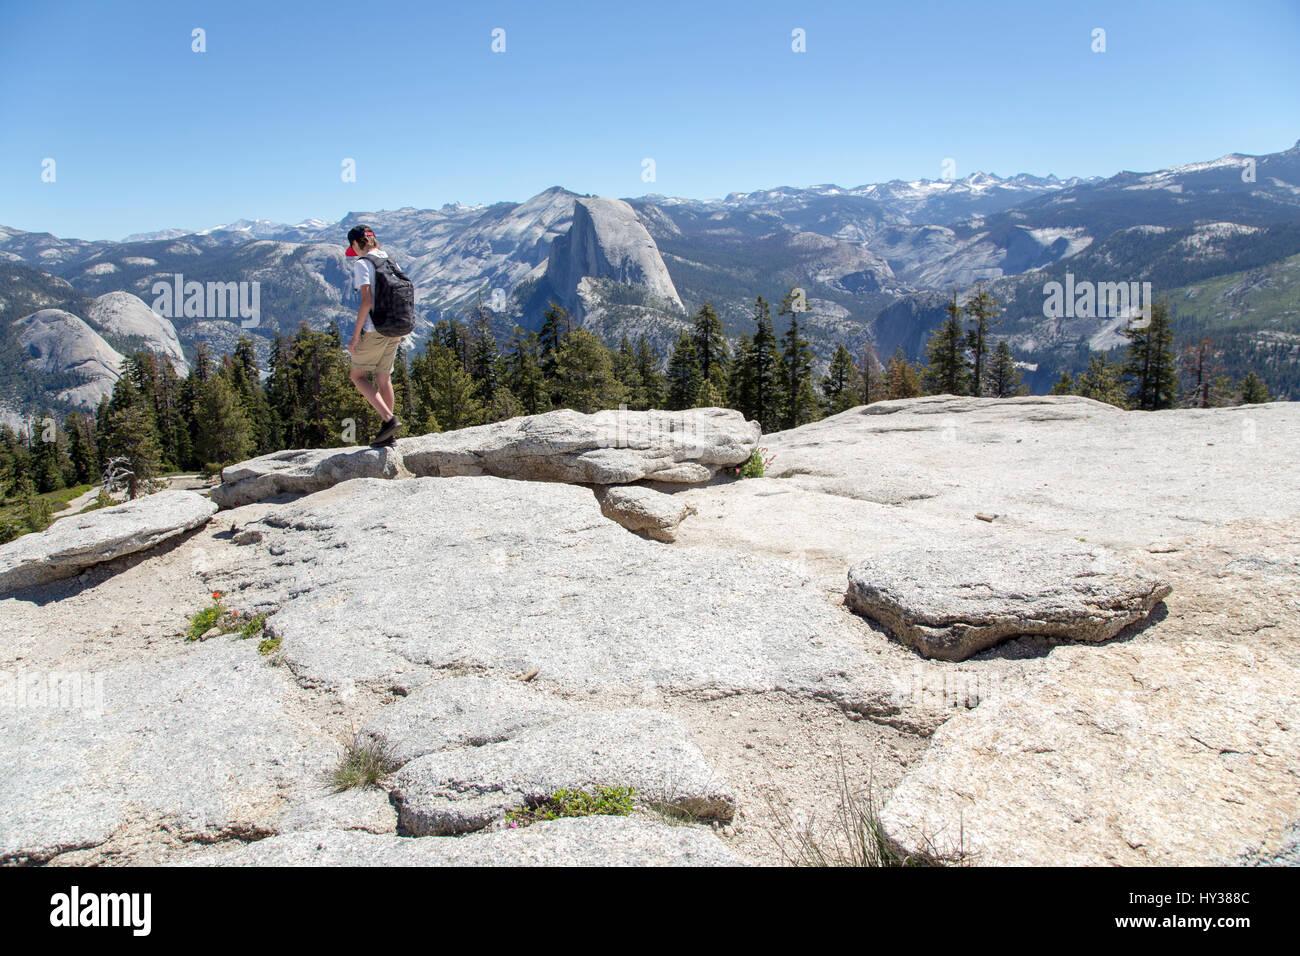 USA, California, Yosemite, Boy (14-15) during mountain trip, Sentinel Dome and Yosemite Falls in background - Stock Image